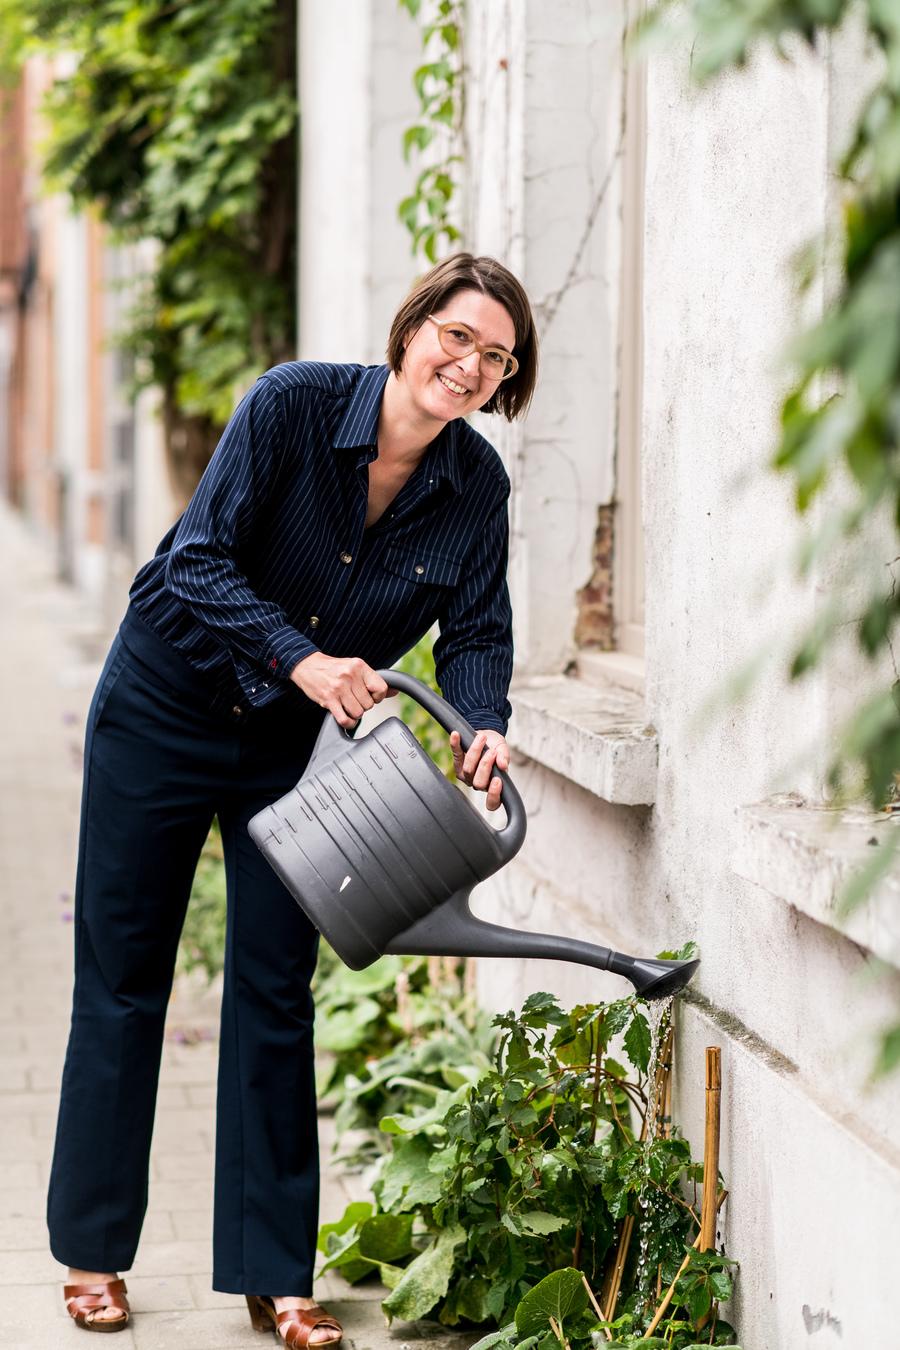 Borgerhoutenaar Greetje verzorgt haar geveltuintje